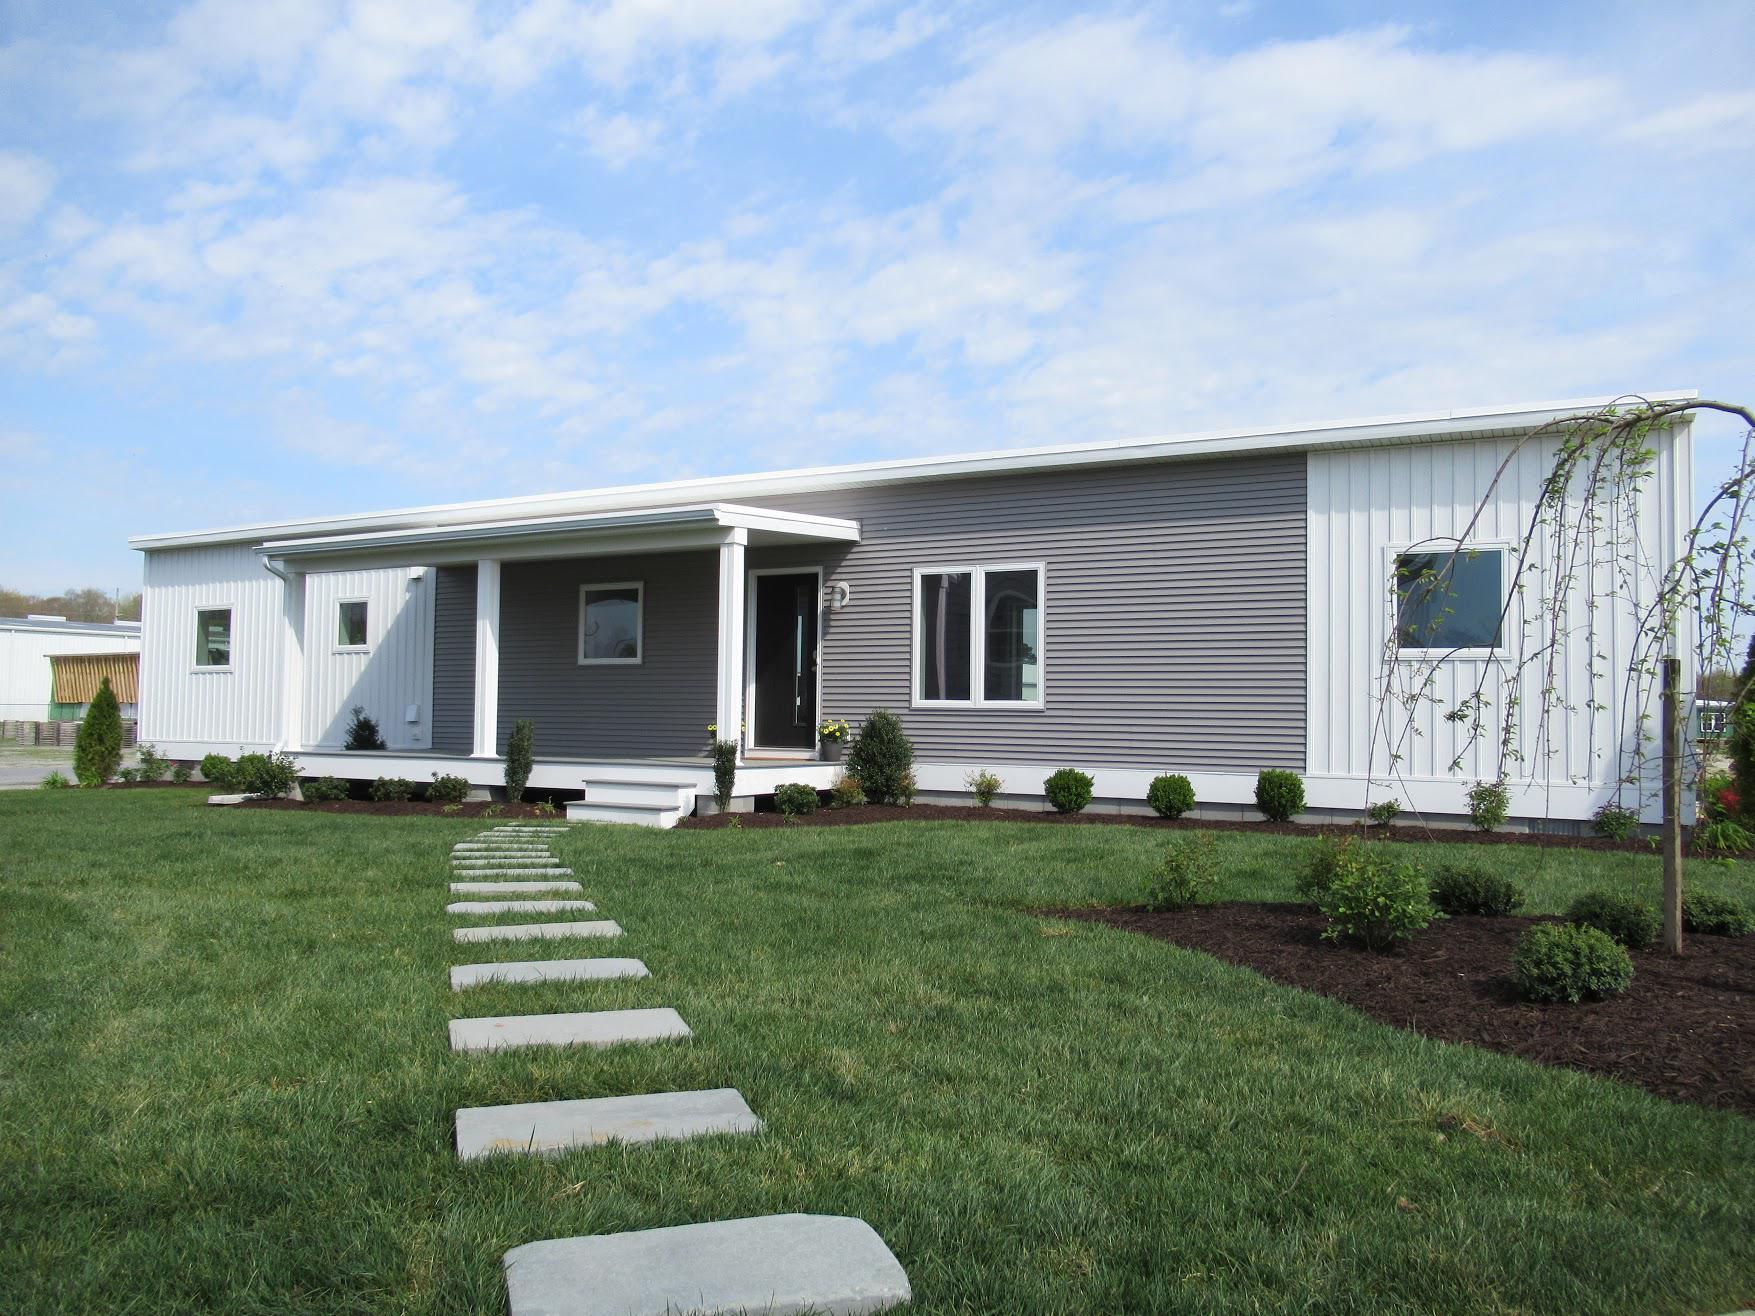 pilot program aims to offer affordable housing option for. Black Bedroom Furniture Sets. Home Design Ideas